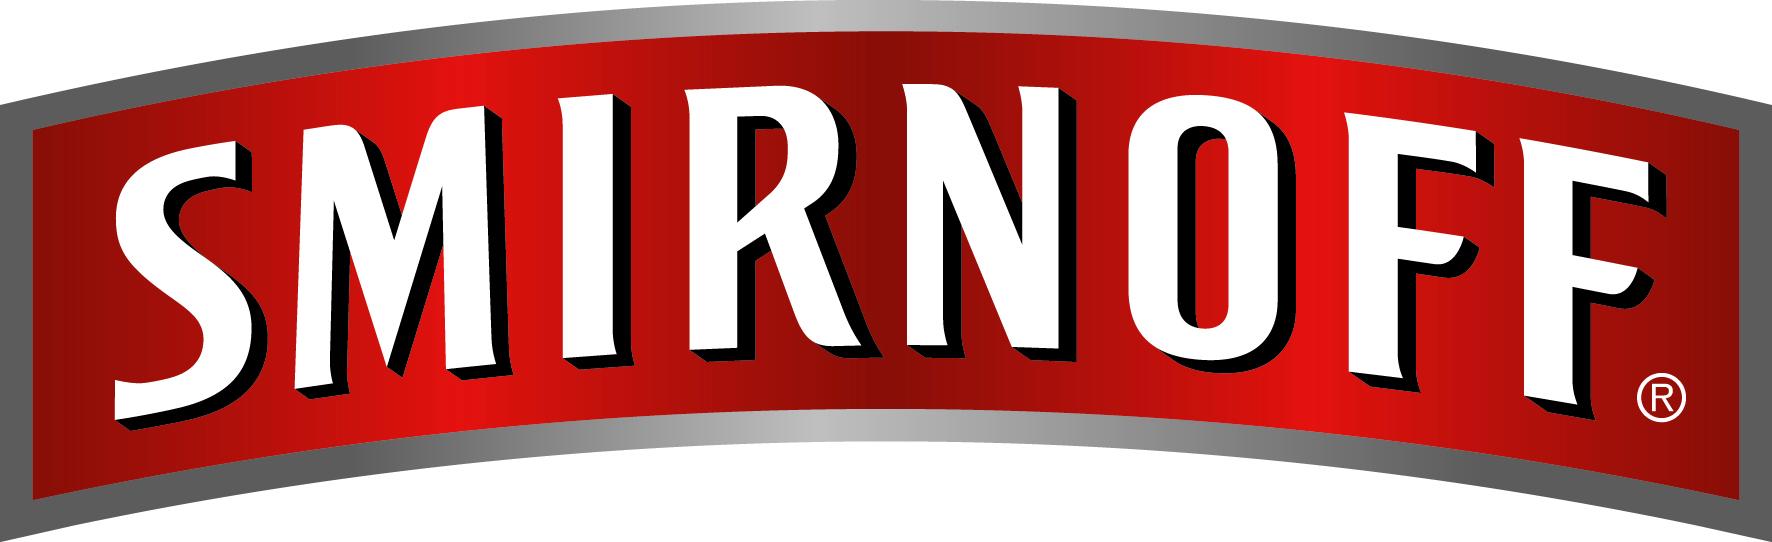 Smirnoff-HD-Logo.jpg